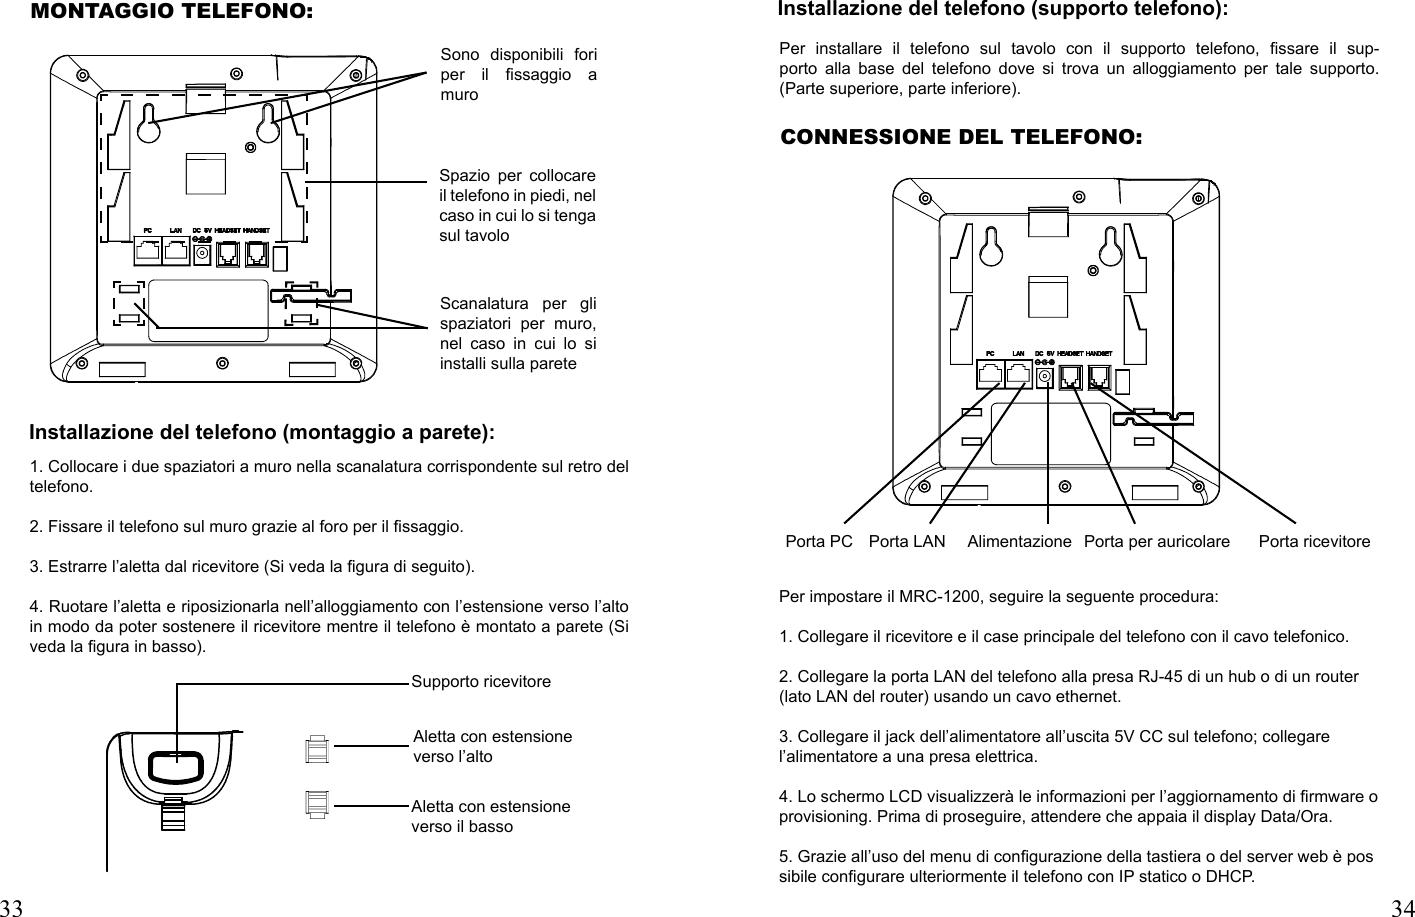 Porta Pc Da Muro.Mrc Networks Mrc 1200 Ip Phone Intercom User Manual 3